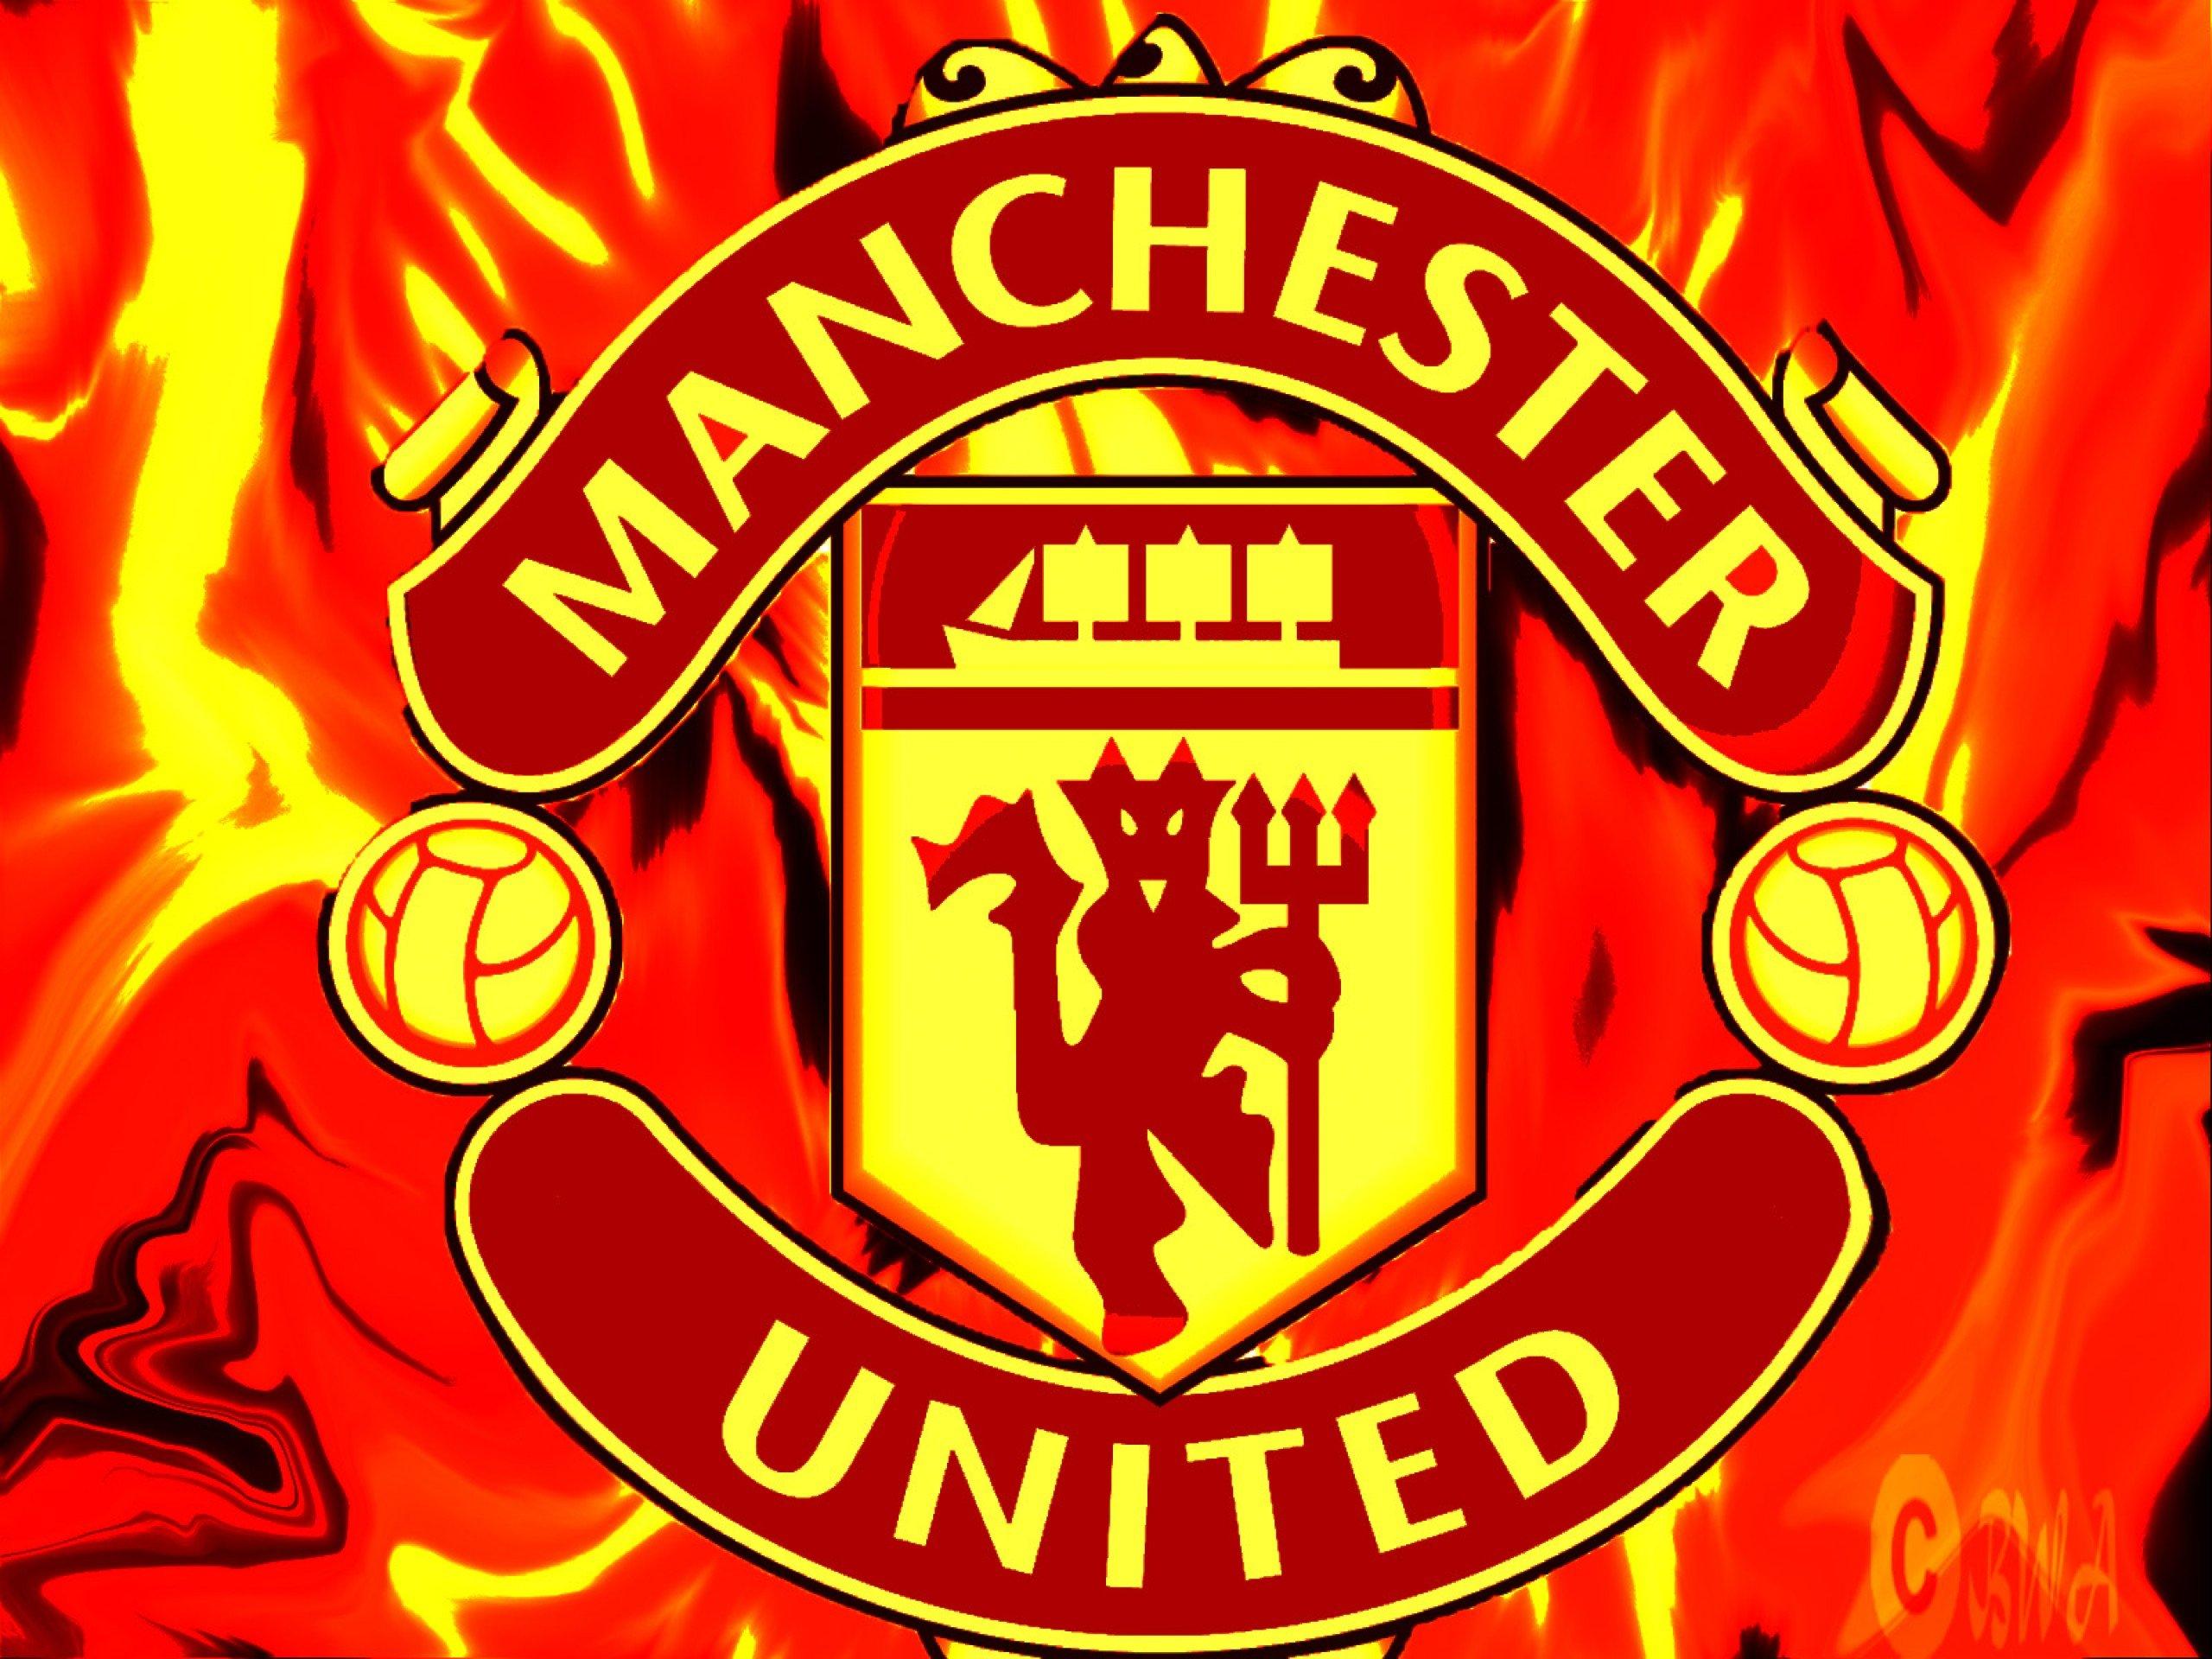 Англия - manchester united fc - результаты даты -